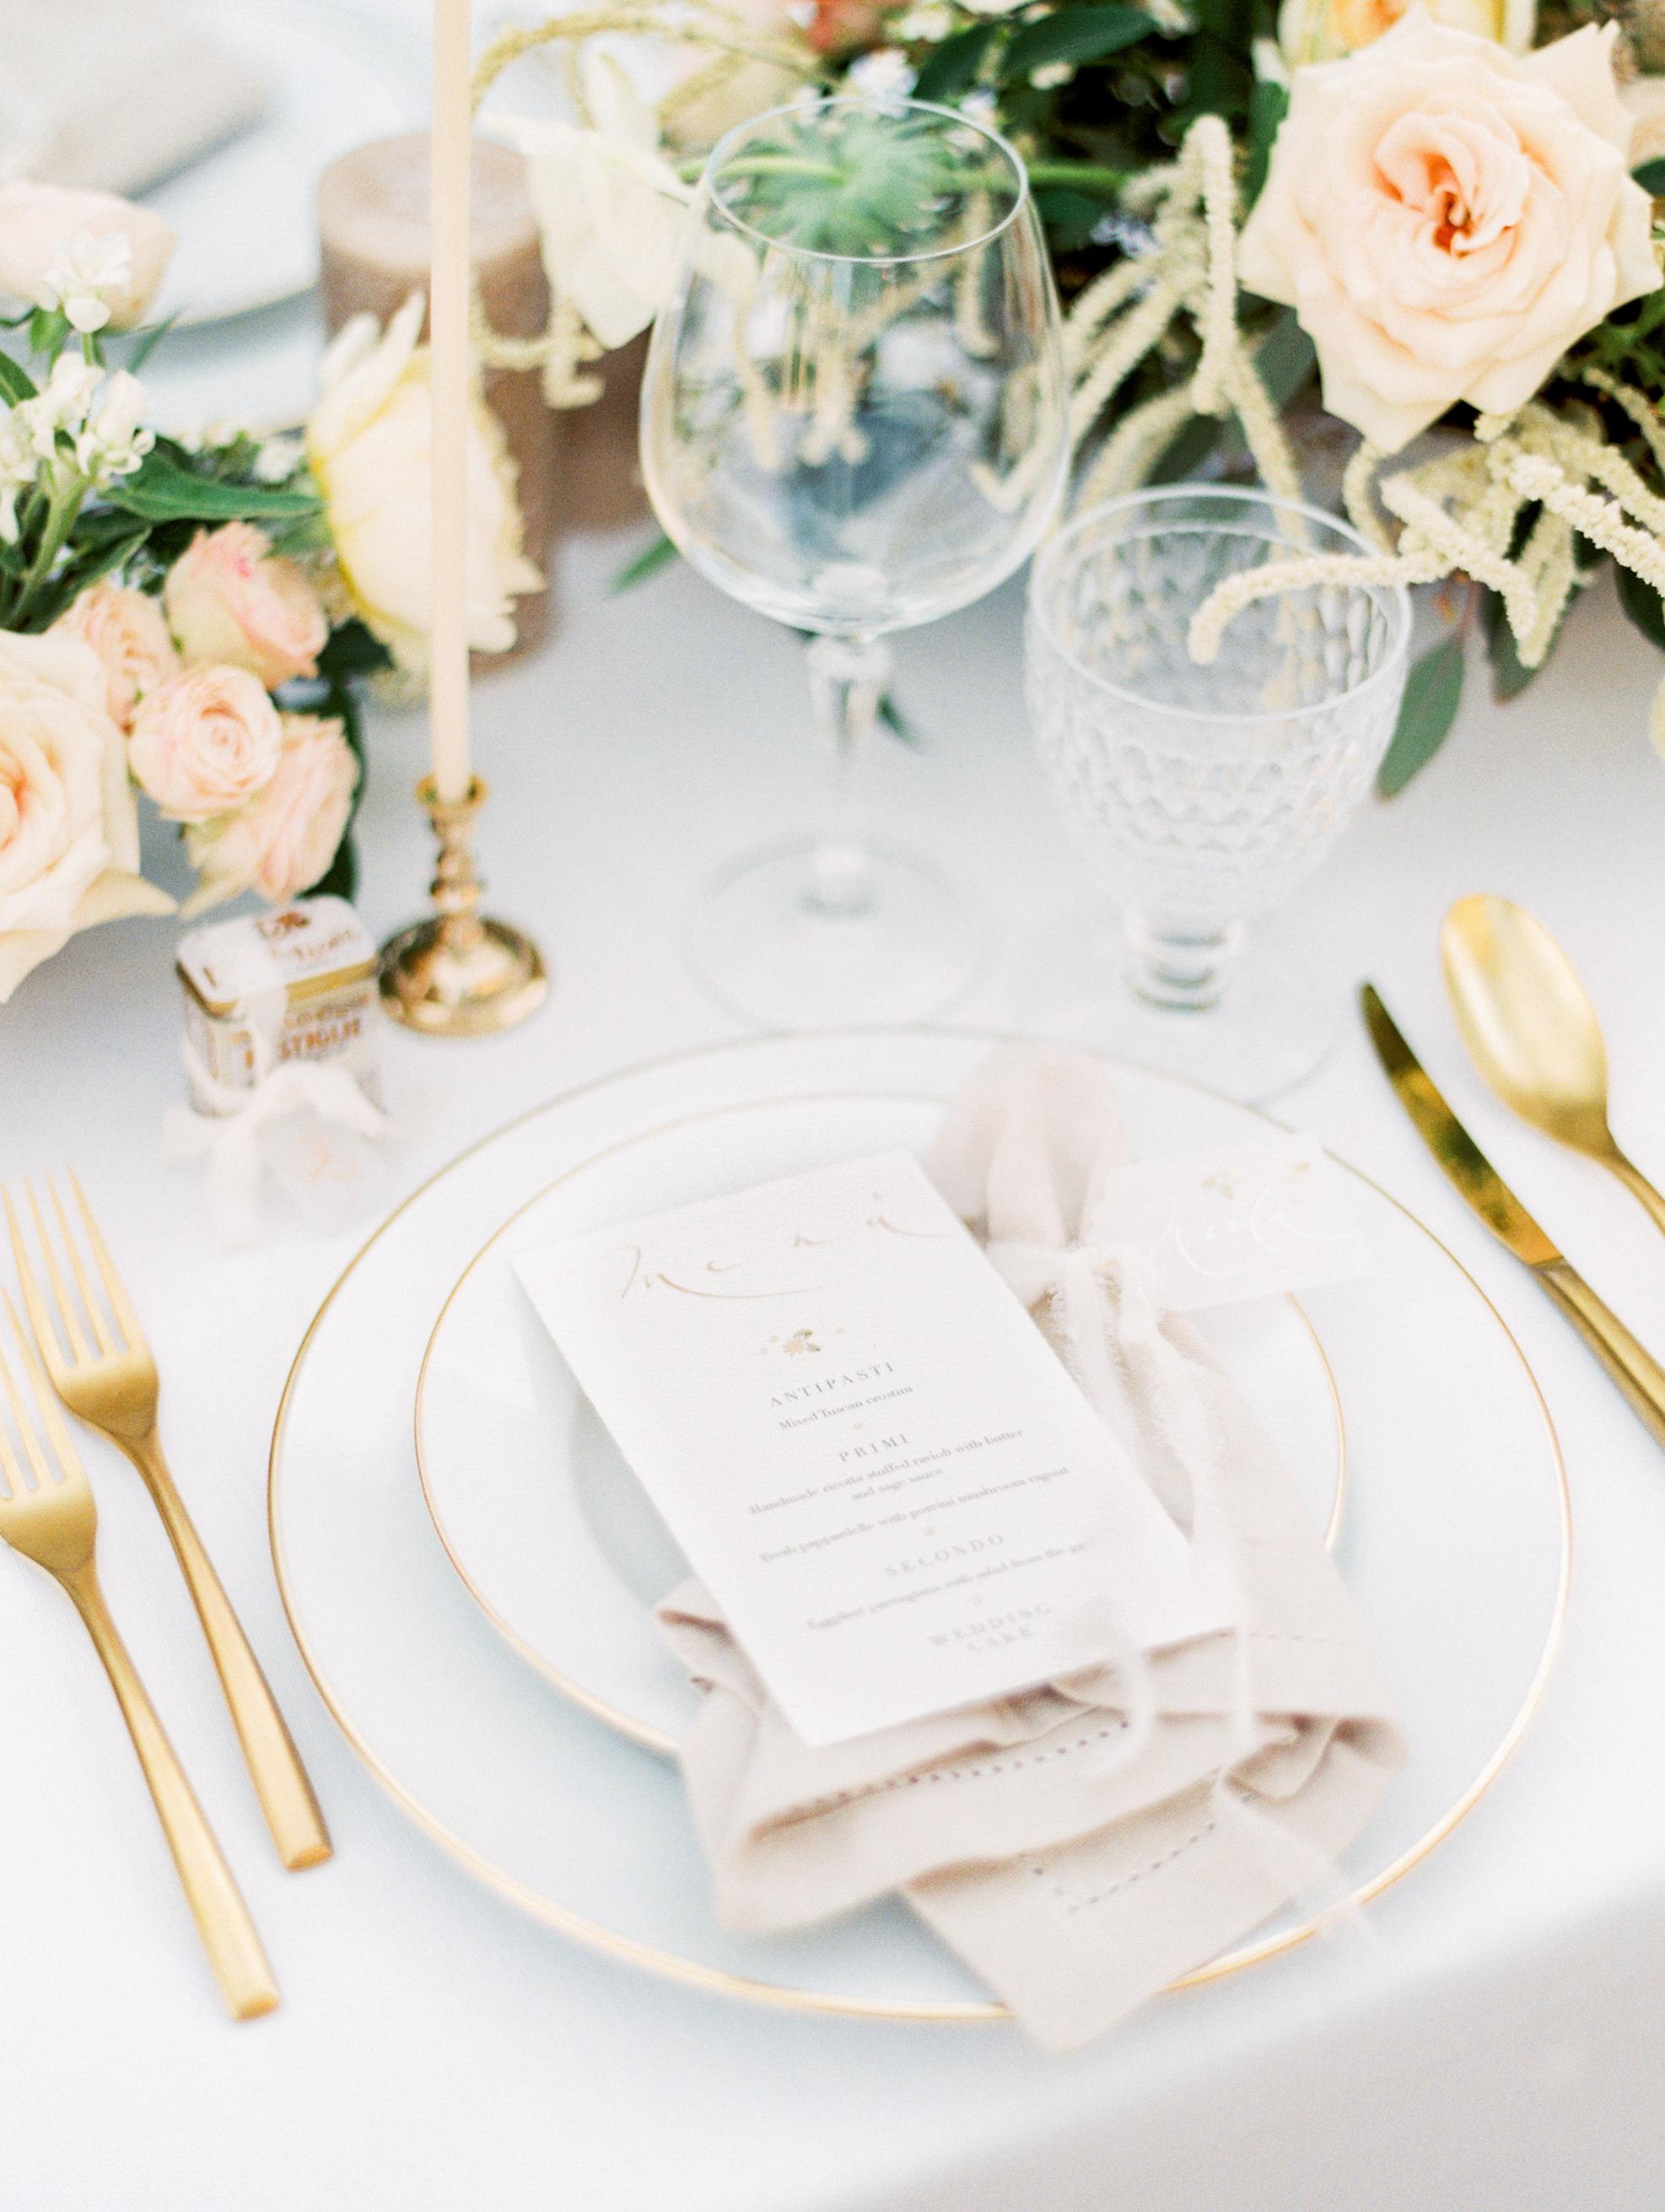 romantic-italy-wedding-in-tuscany-64.jpg